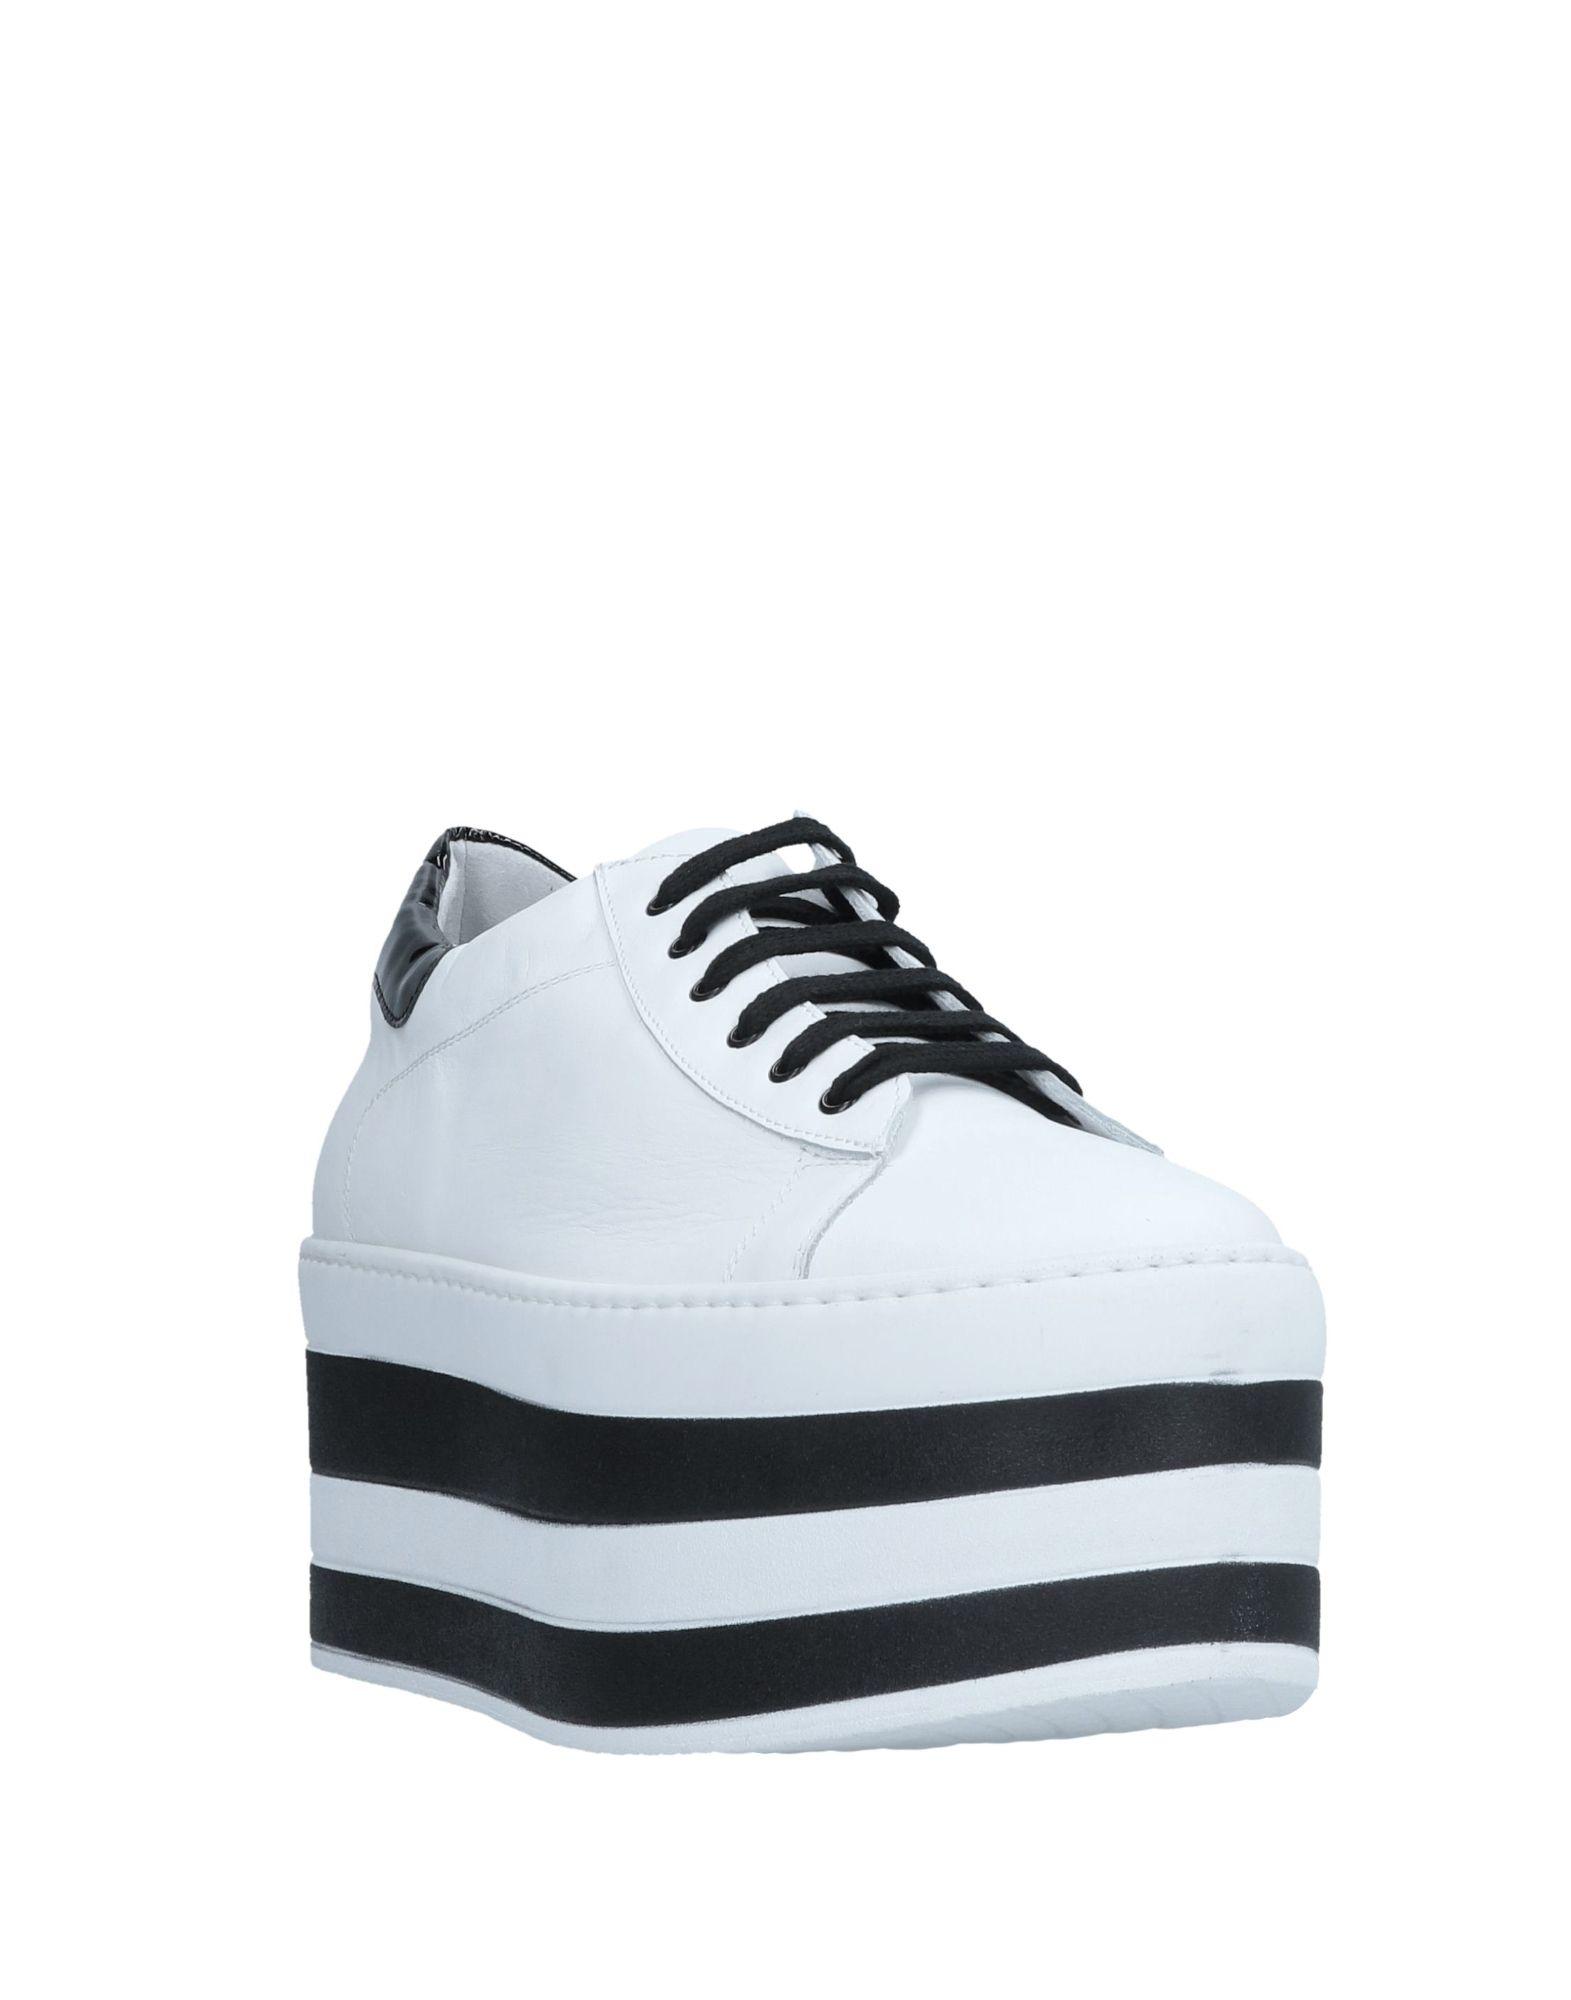 11546467CO Piampiani Sneakers Damen  11546467CO  0fa868